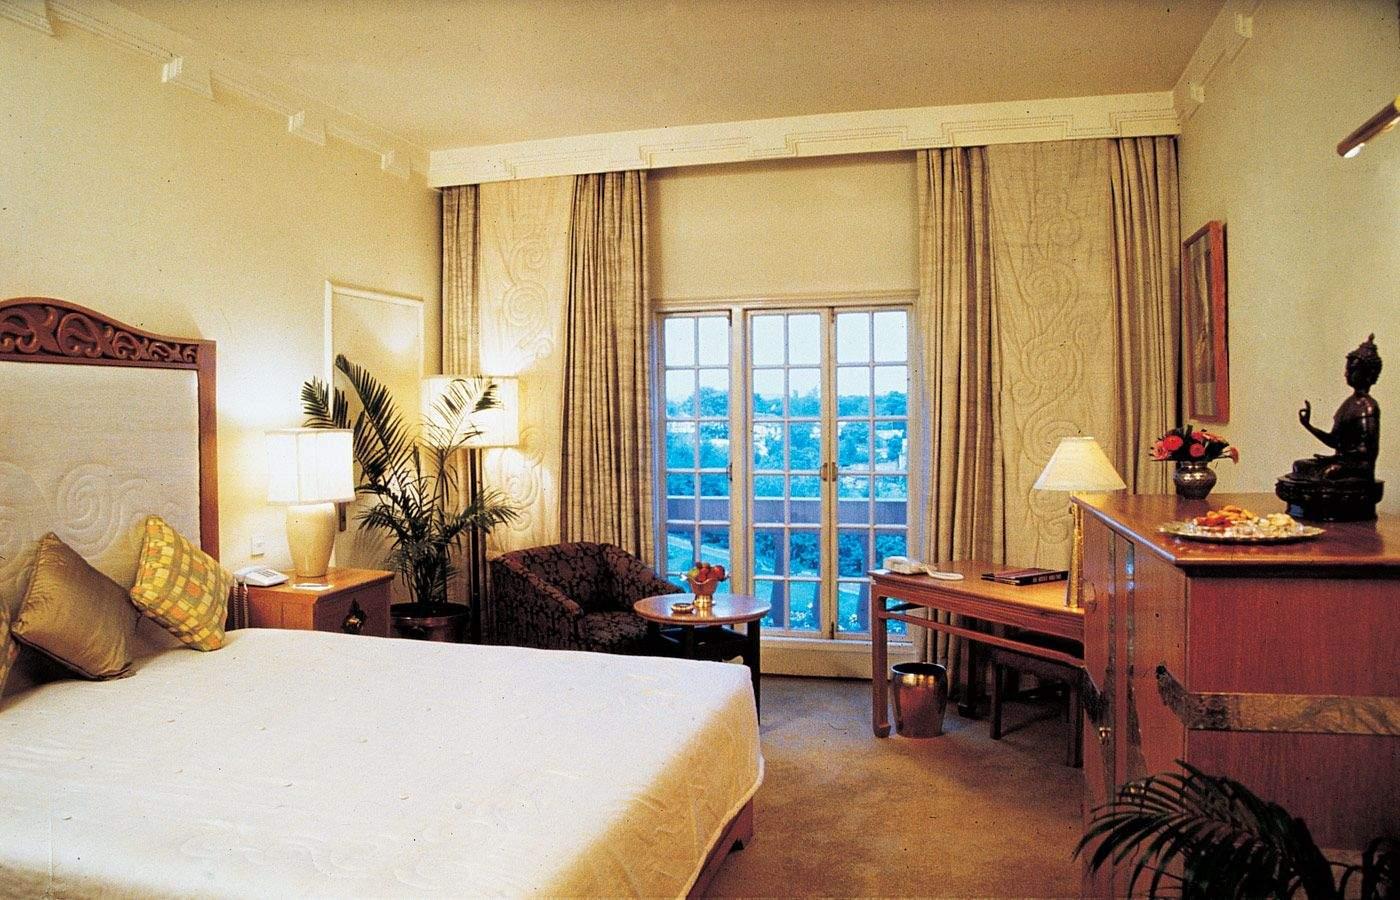 Hotel%20Yak%20And%20Yeti%20Kathmandu%20club-room.jpeg